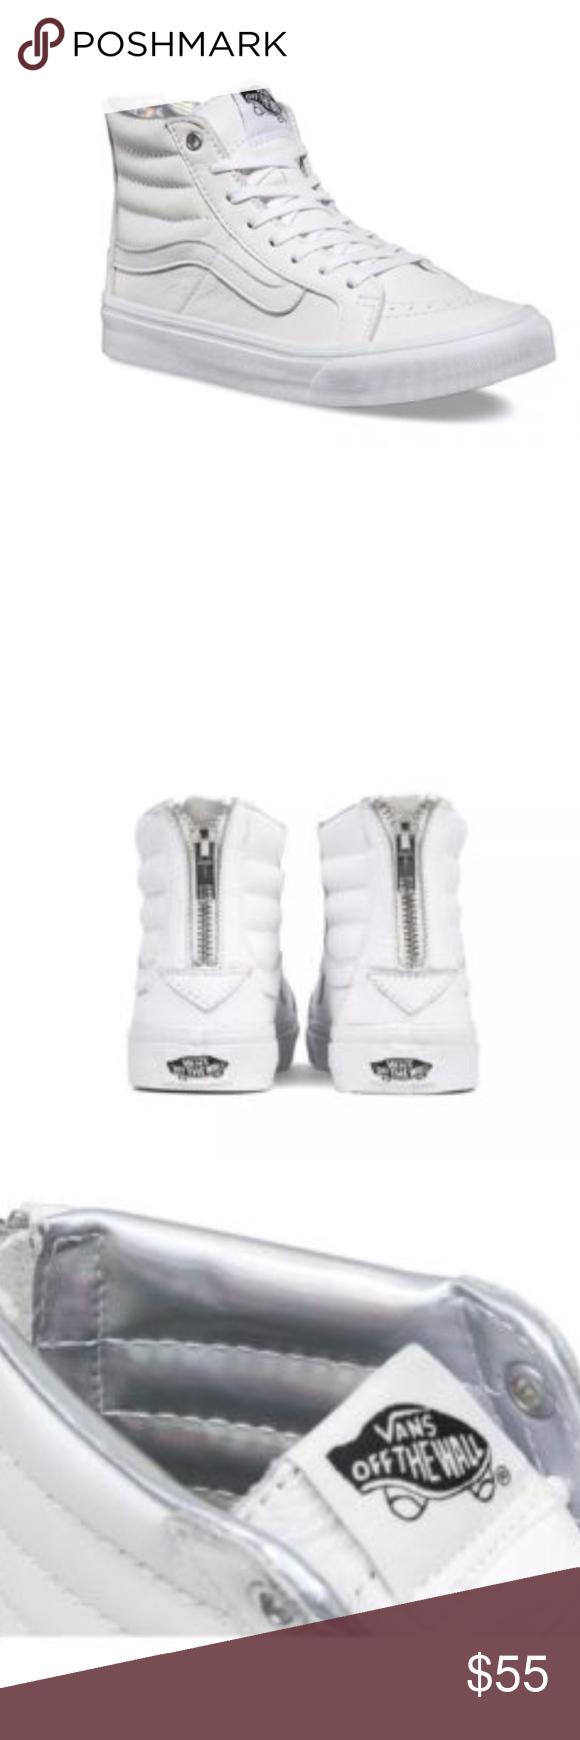 ffd8bb0c59 Vans SK8 Hi Slim Zip Hologram True White Vans SK8 Hi Slim Zip Hologram True  White True White Women Shoes Size 8.5 Brand new in box Vans Shoes Athletic  Shoes